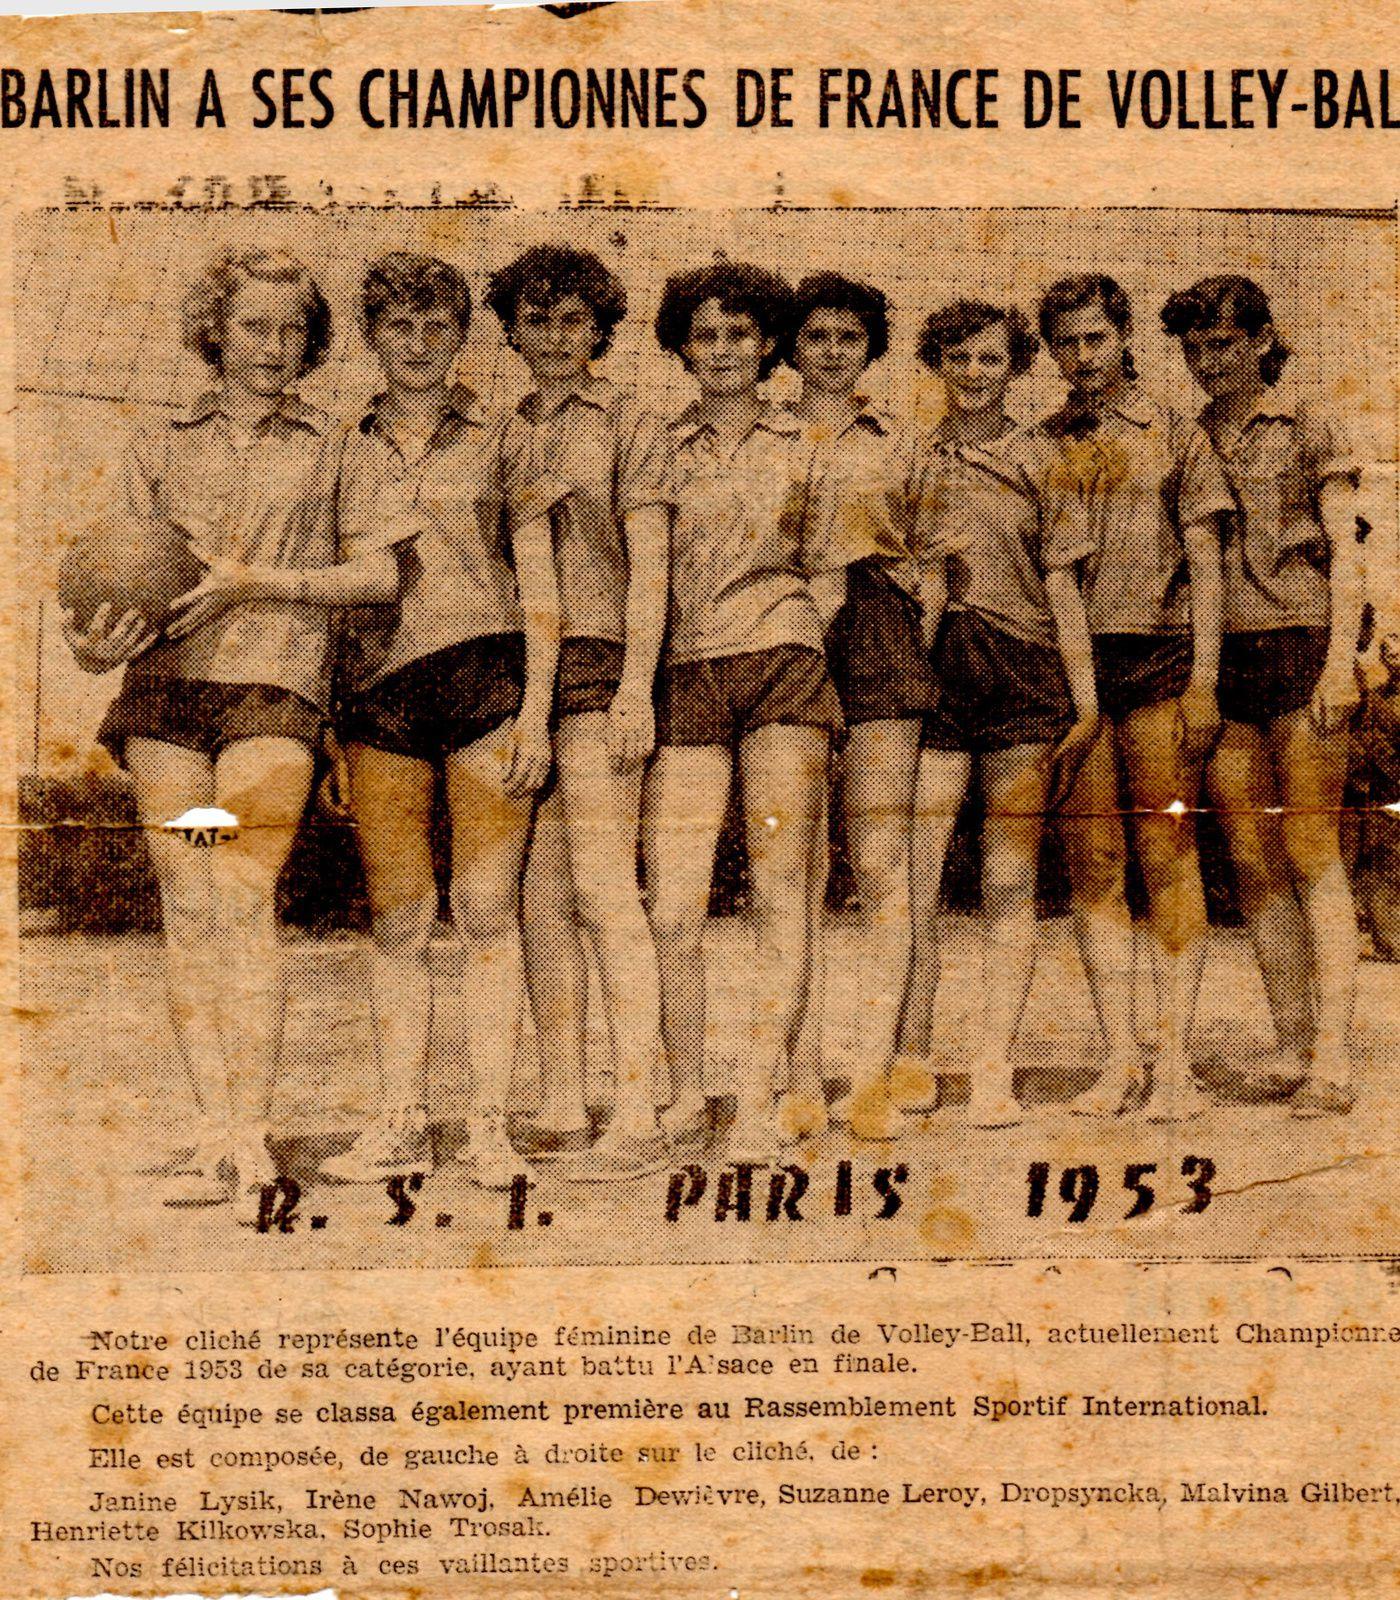 Barlin champion de France de volley-ball